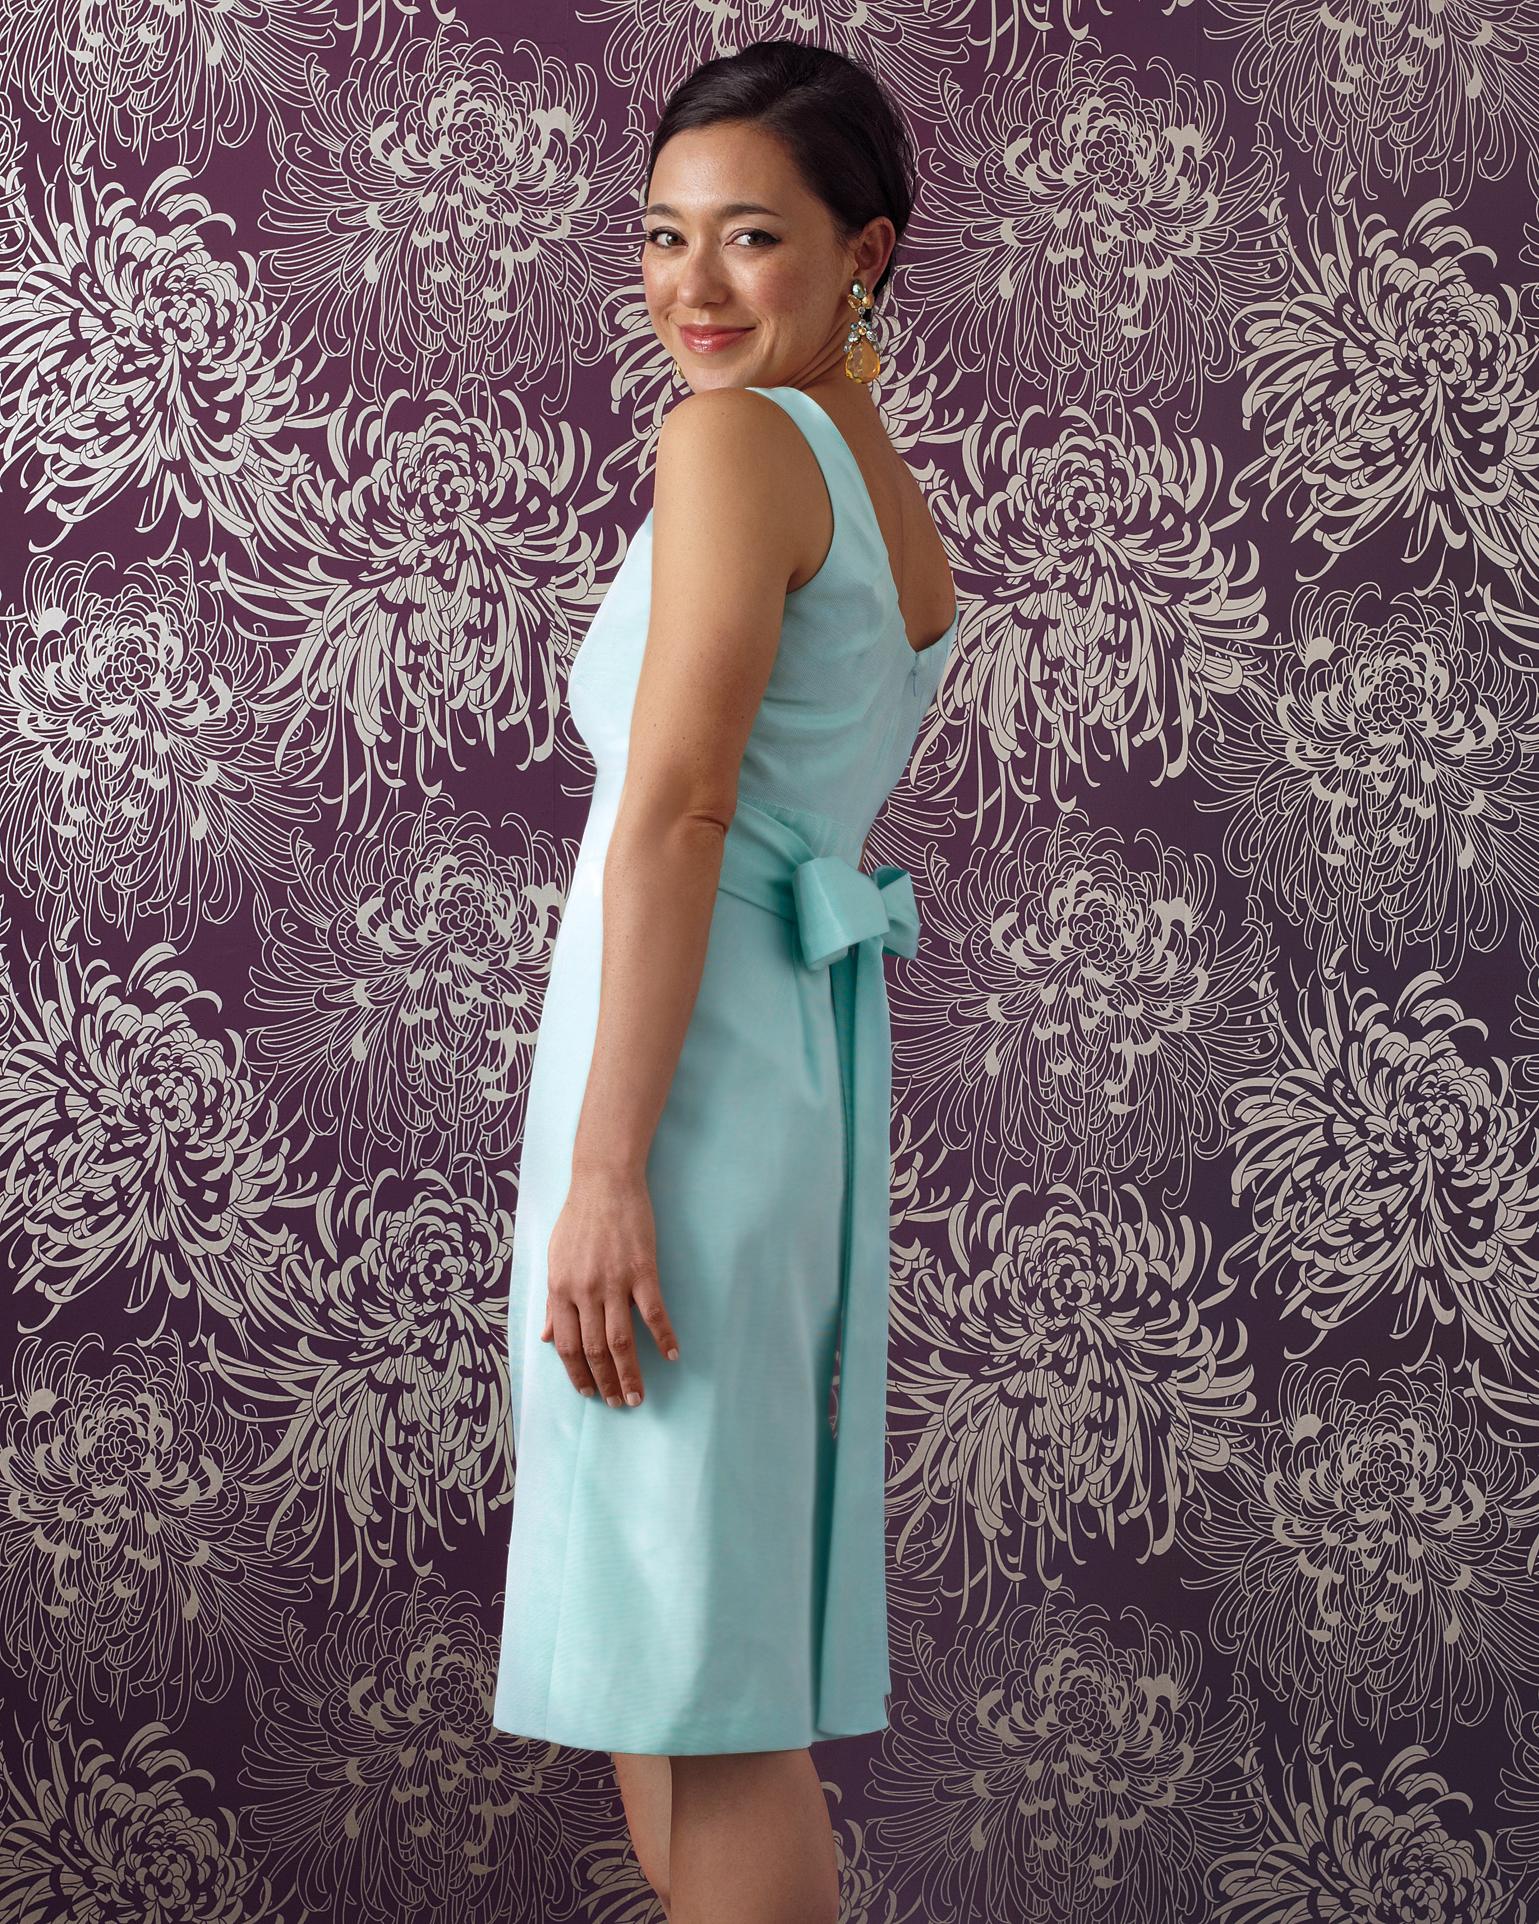 bridesmaid-4-0811mwd107436.jpg